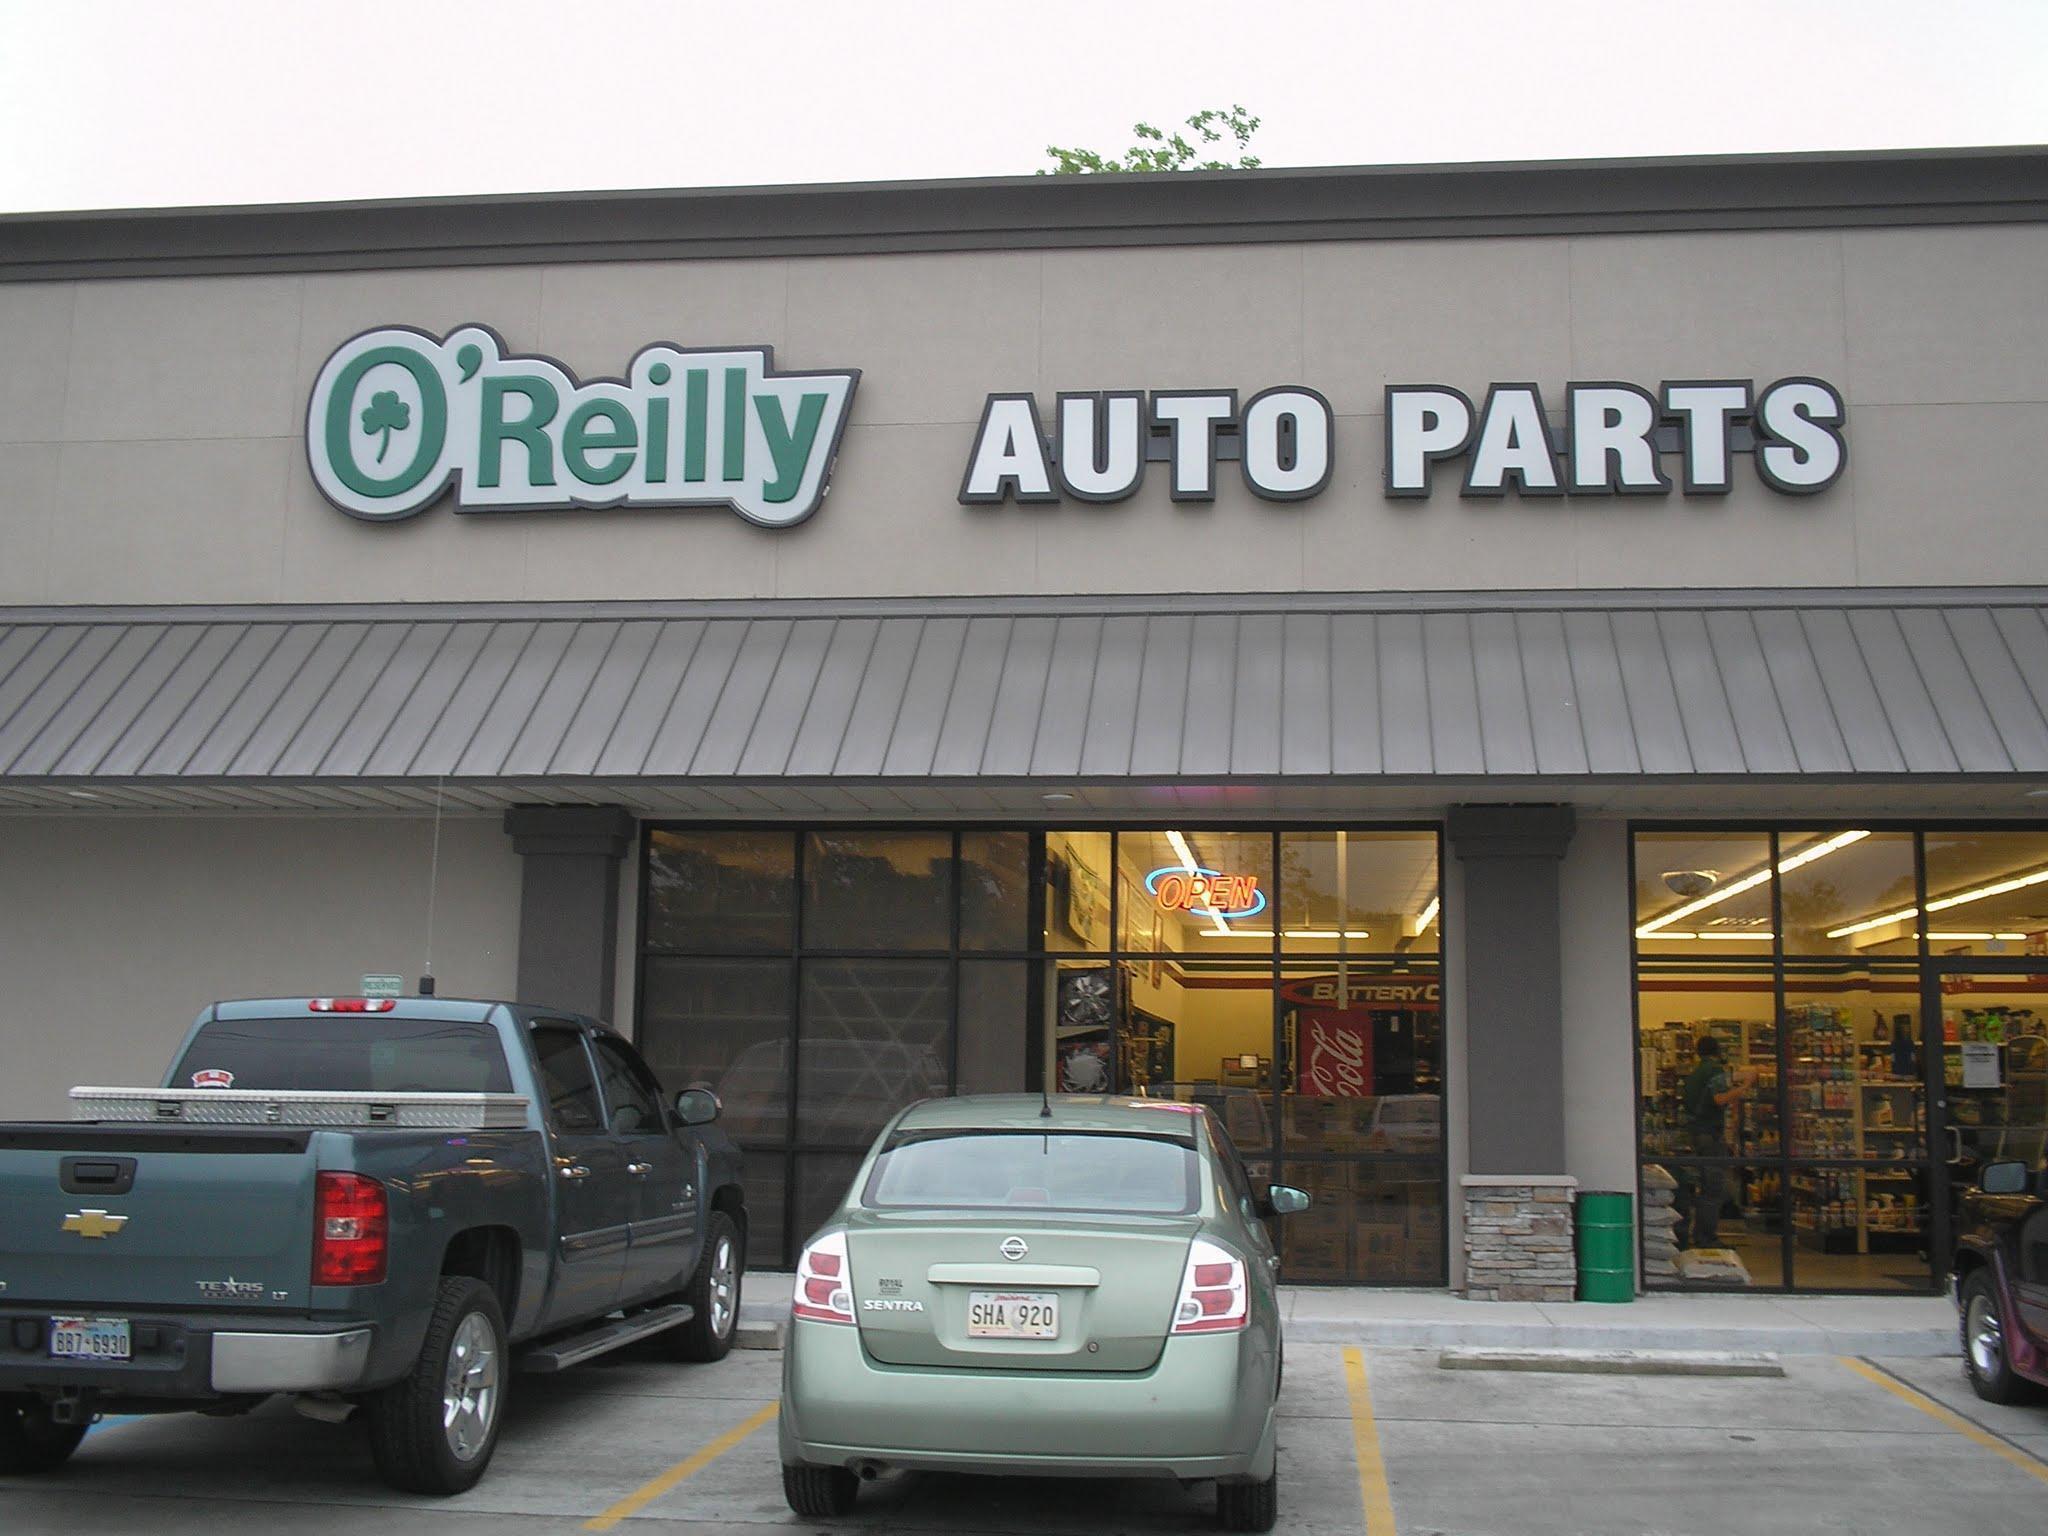 o'reilly auto parts - photo #31